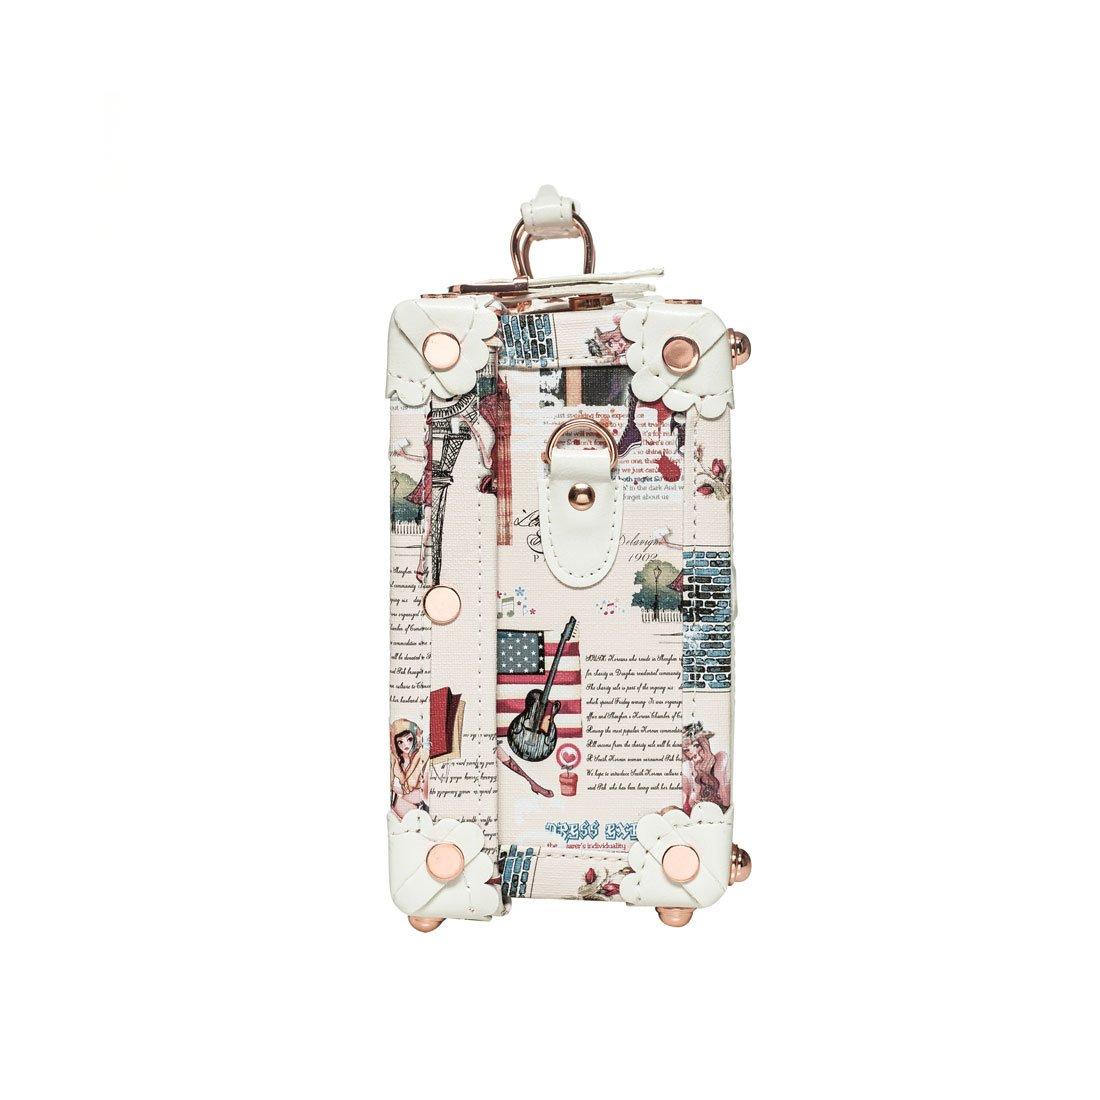 a8f599e693b2 ایگرد - خرید از آمازون | 13 Inch Women Pu Leather Small Suitcase ...